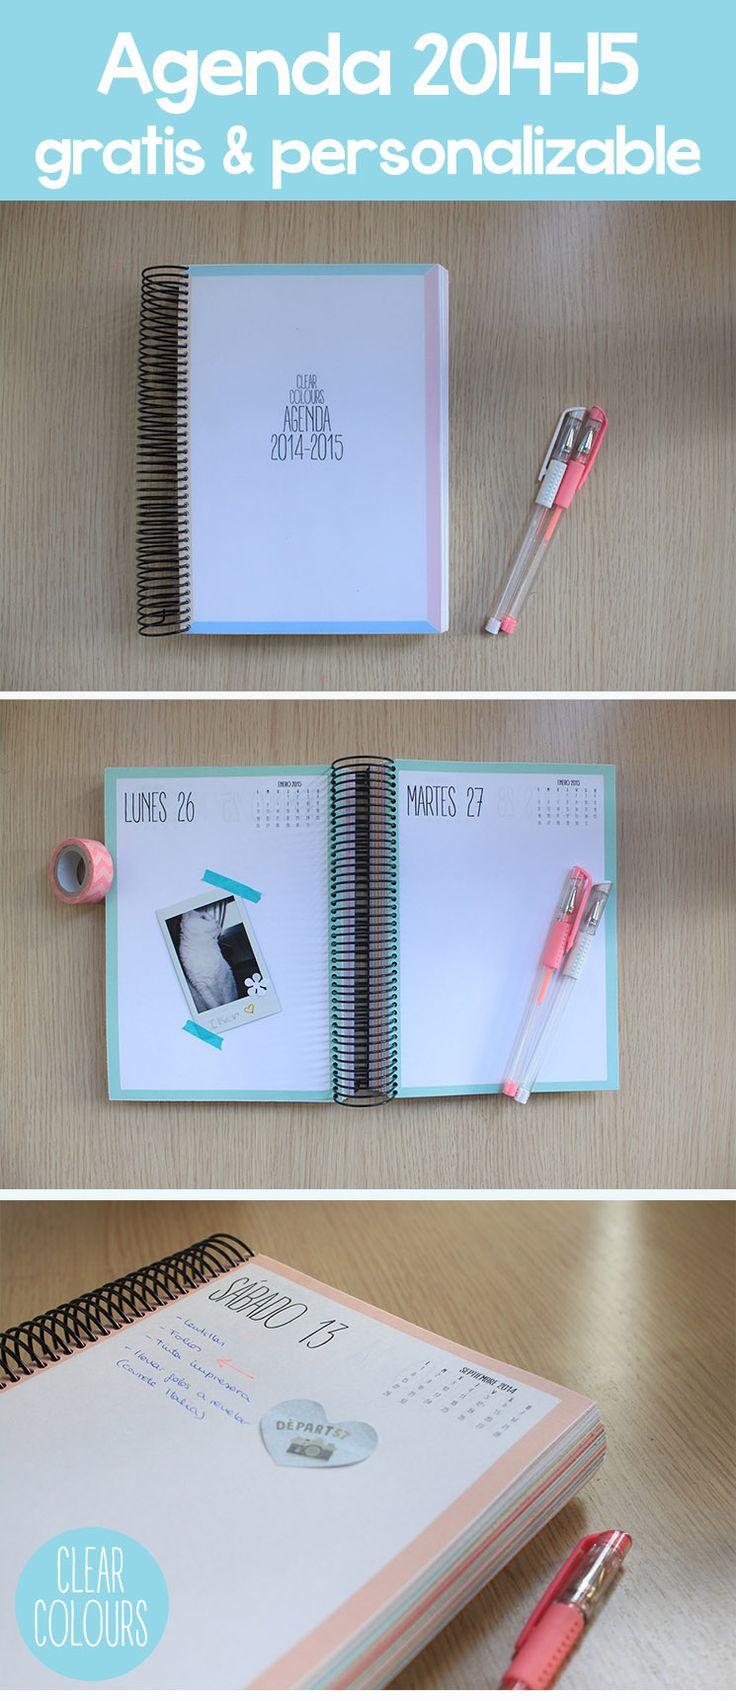 Clear Colours: Agenda 2014-2015 Gratis y personalizable